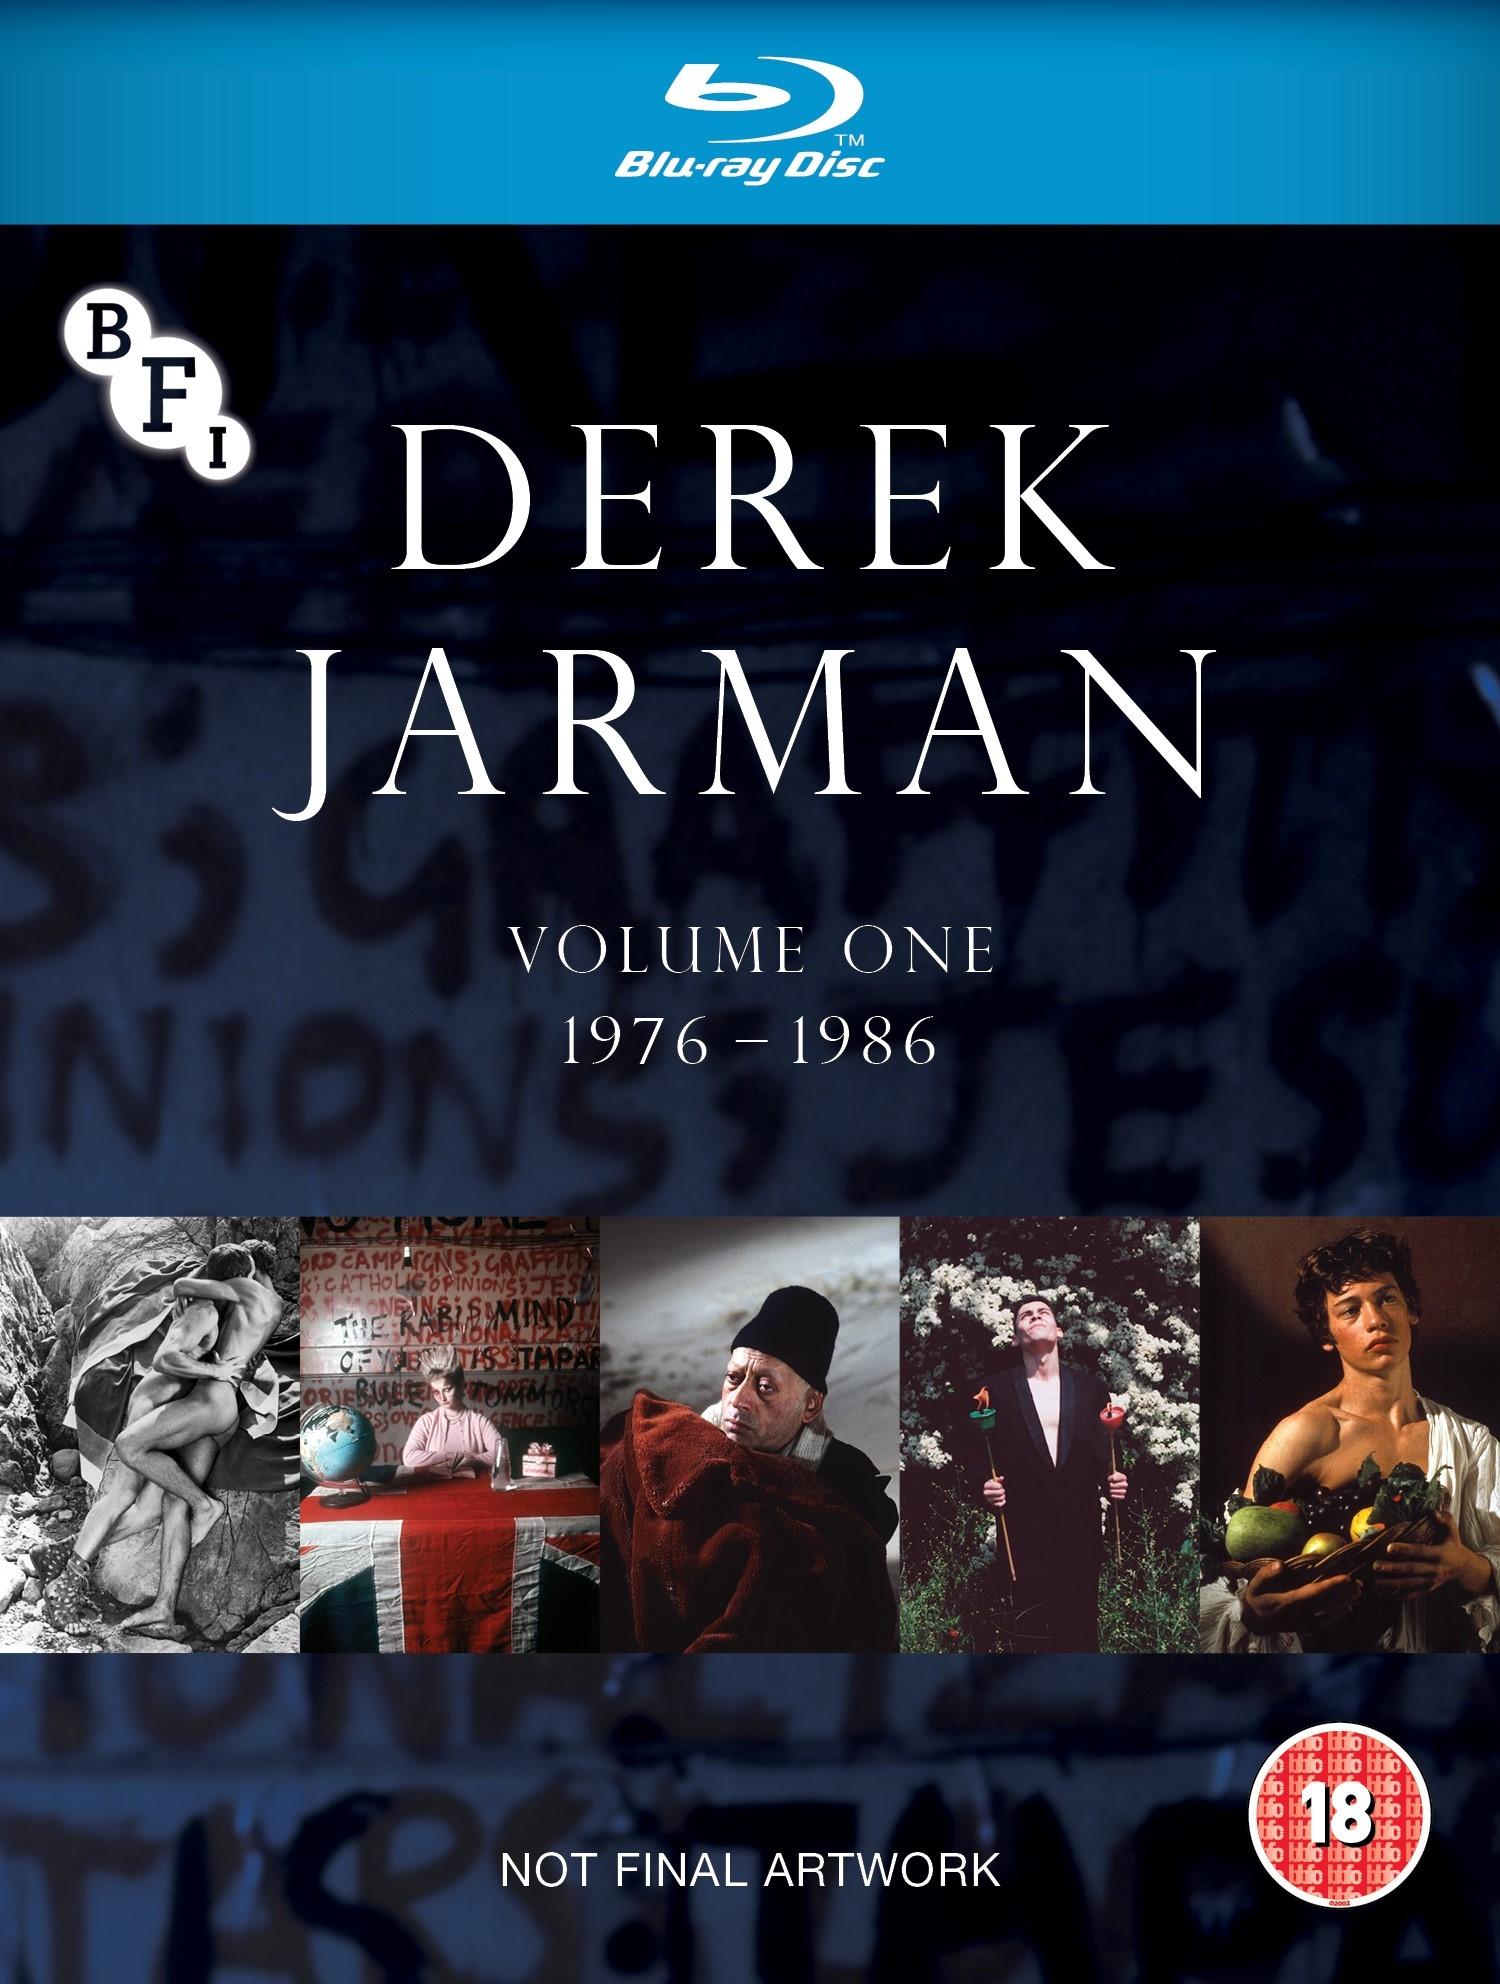 Buy PRE-ORDER Derek Jarman Volume 1: 1976-1986 (Limited Edition Blu-ray set)